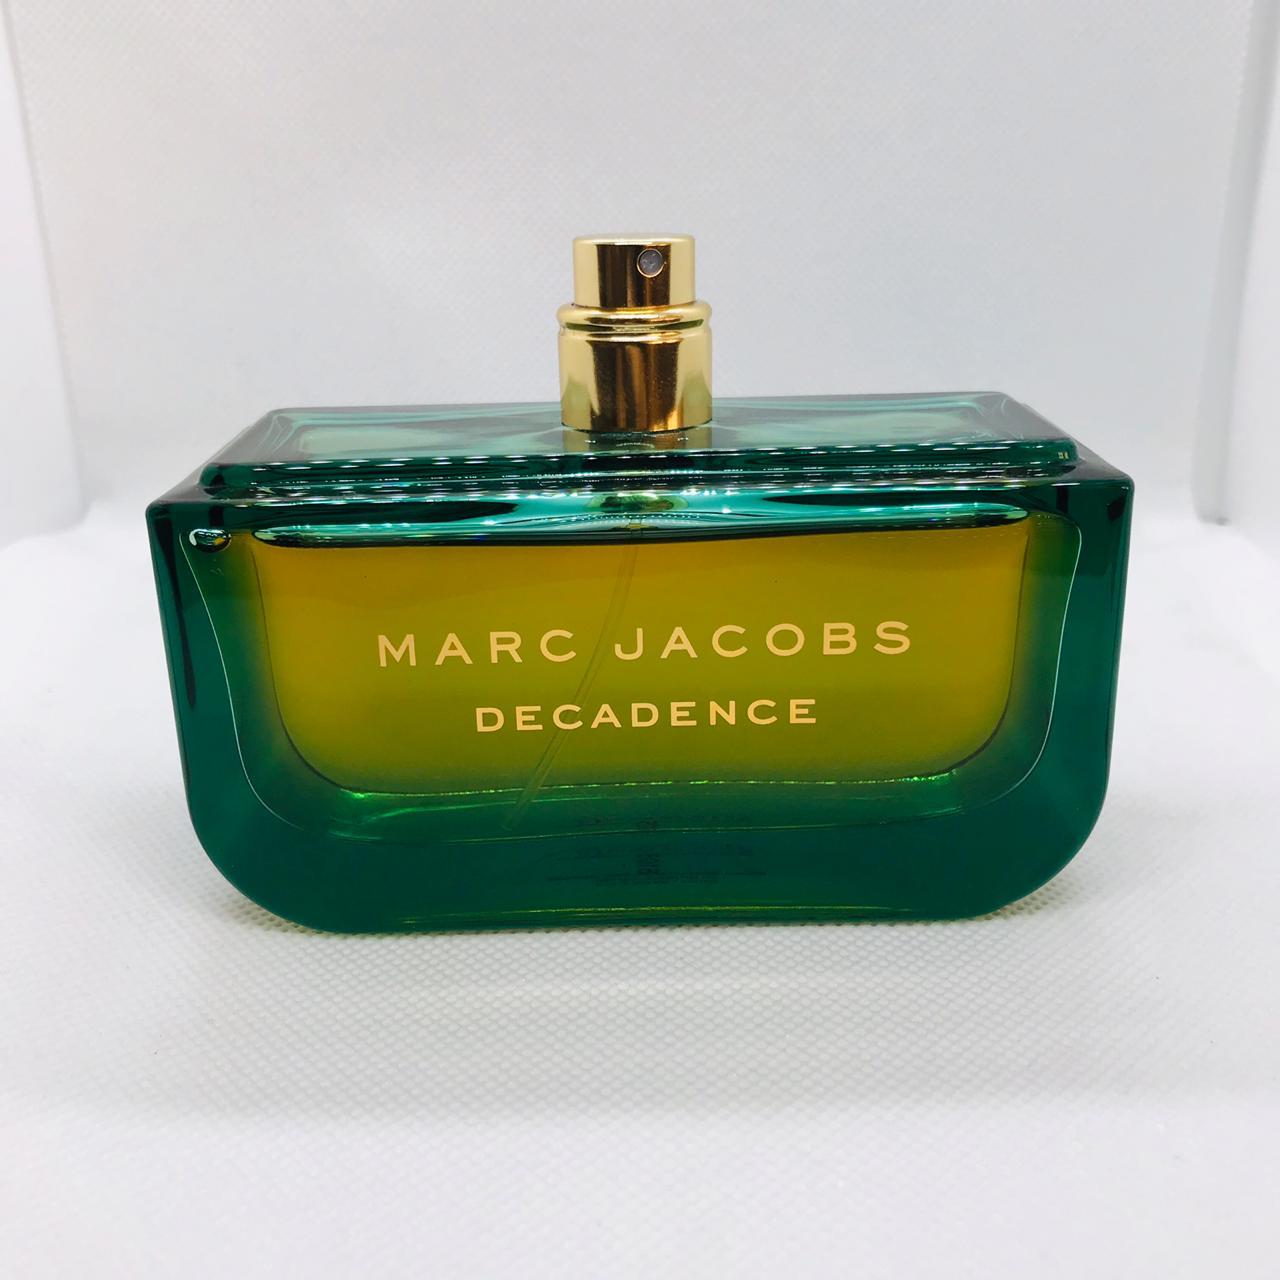 Decadence Marc Jacobs Feminino Eau de Parfum 100ML - Tester